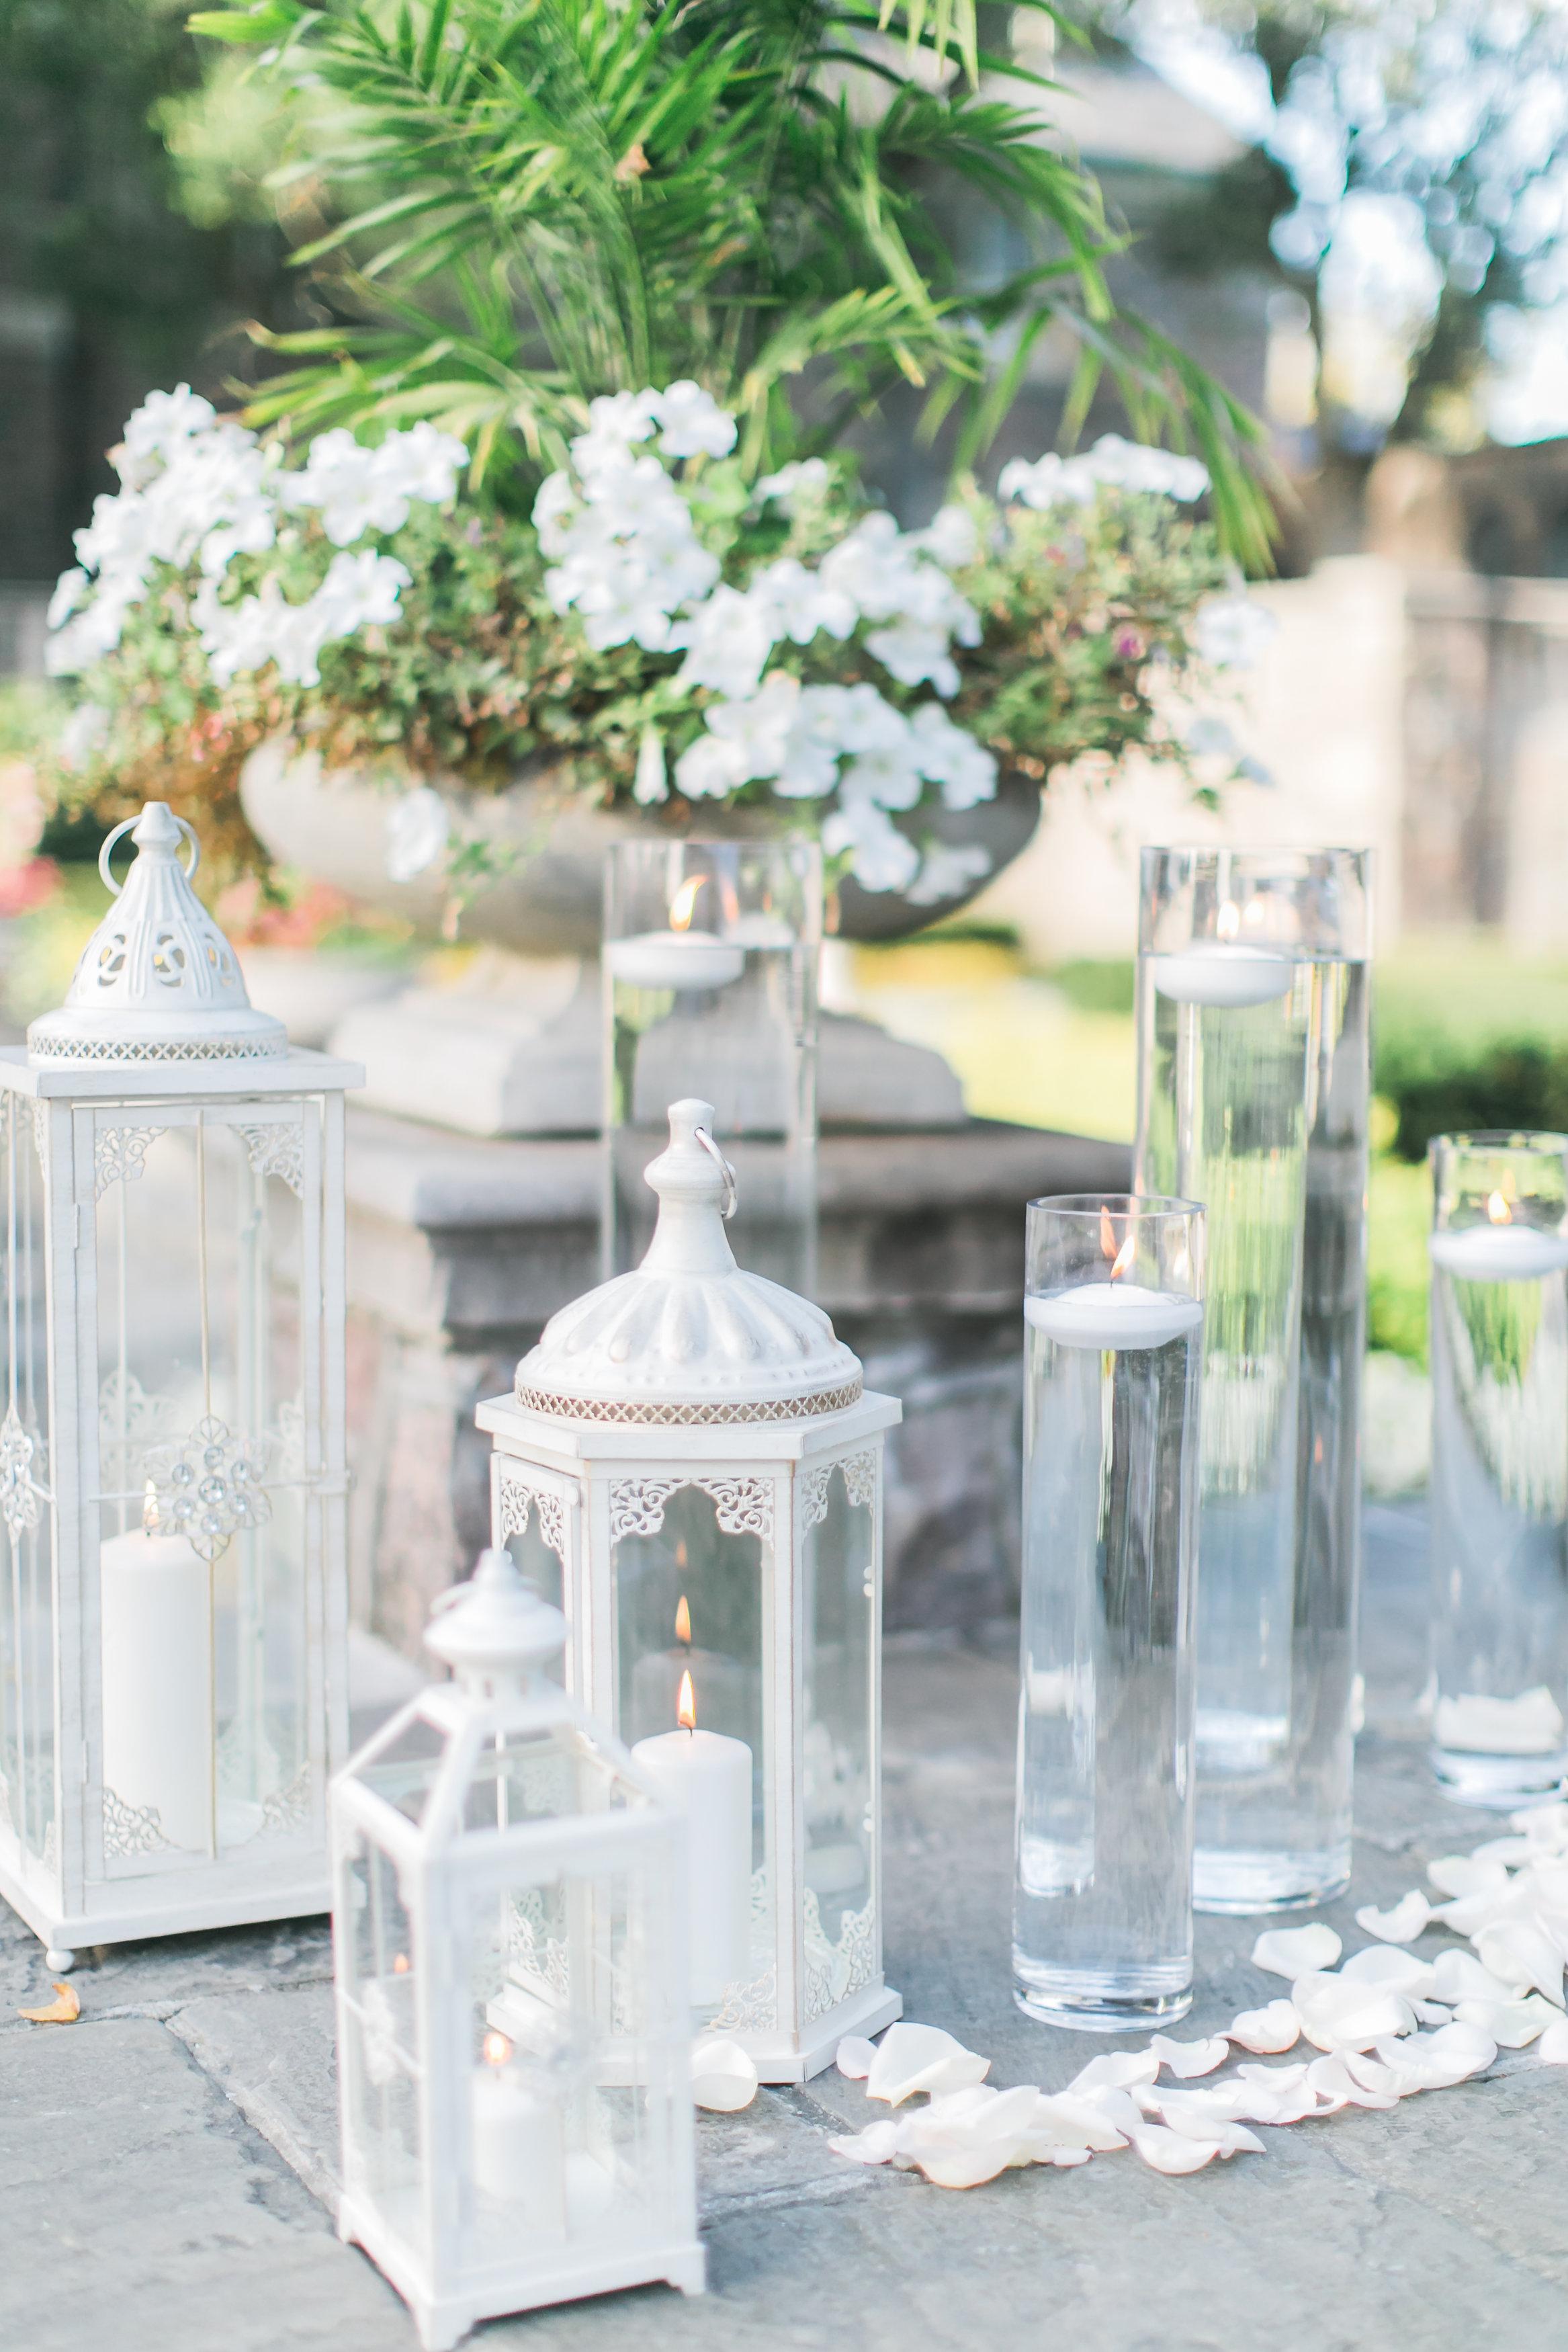 Phoebe Lo Events Toronto Wedding - Graydon Hall Manor Garden Charm Event 021.jpg